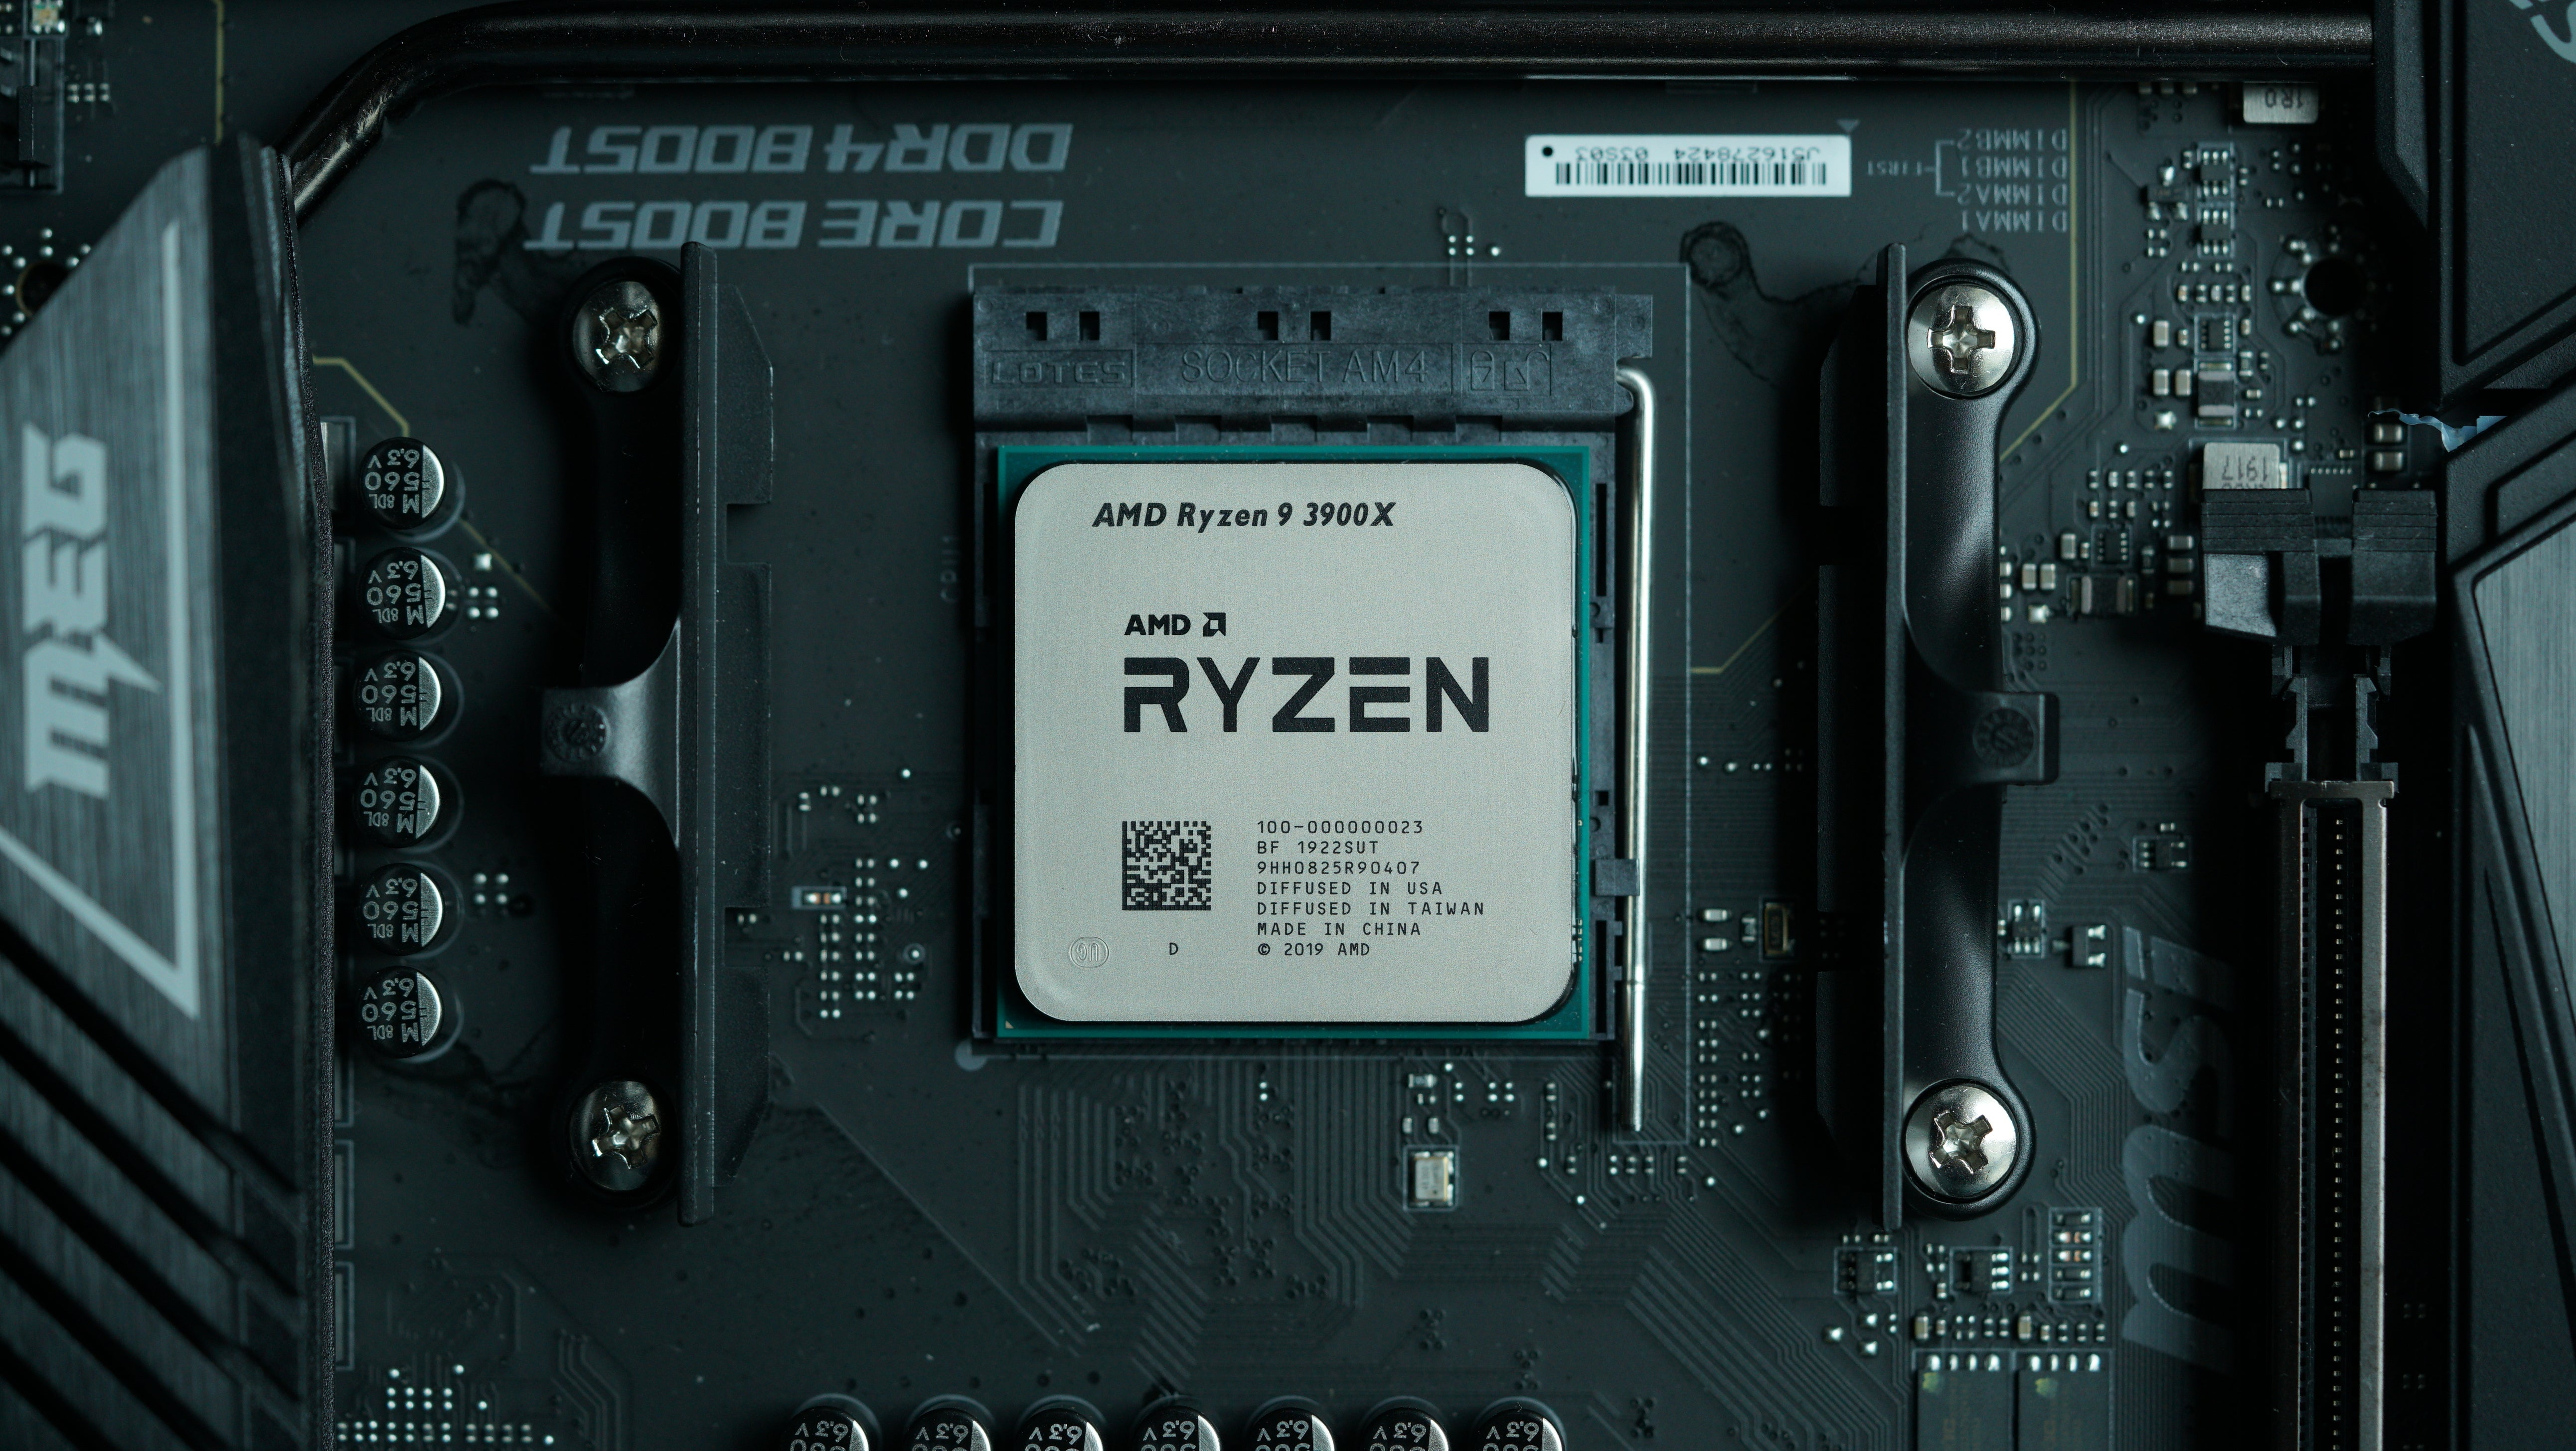 Ryzen 3000 Review: AMD's 12-core Ryzen 9 3900X conquers all